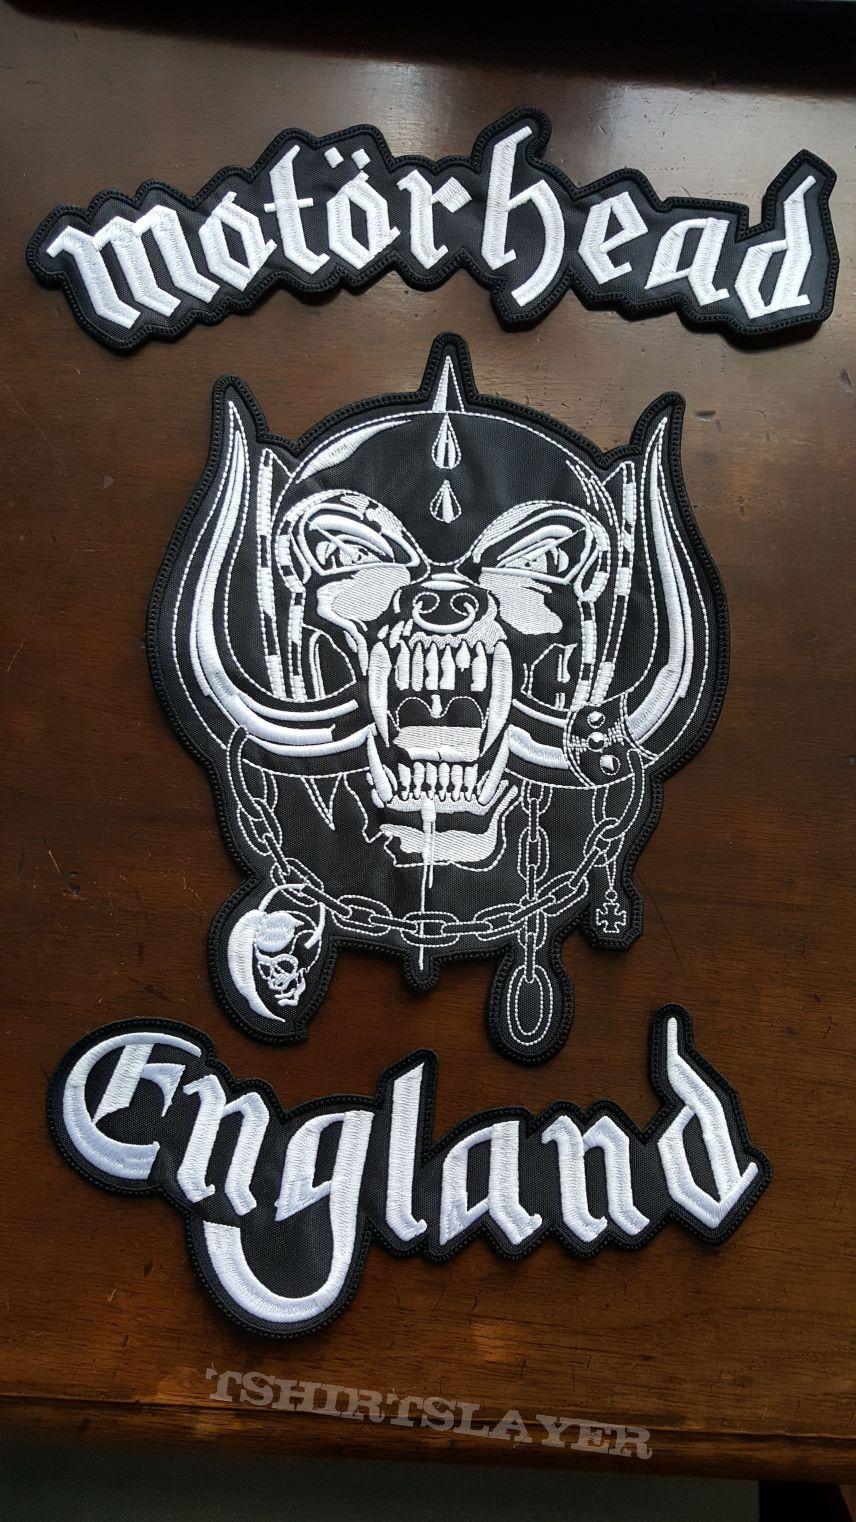 Motörhead England - 3 Piece Backpatch